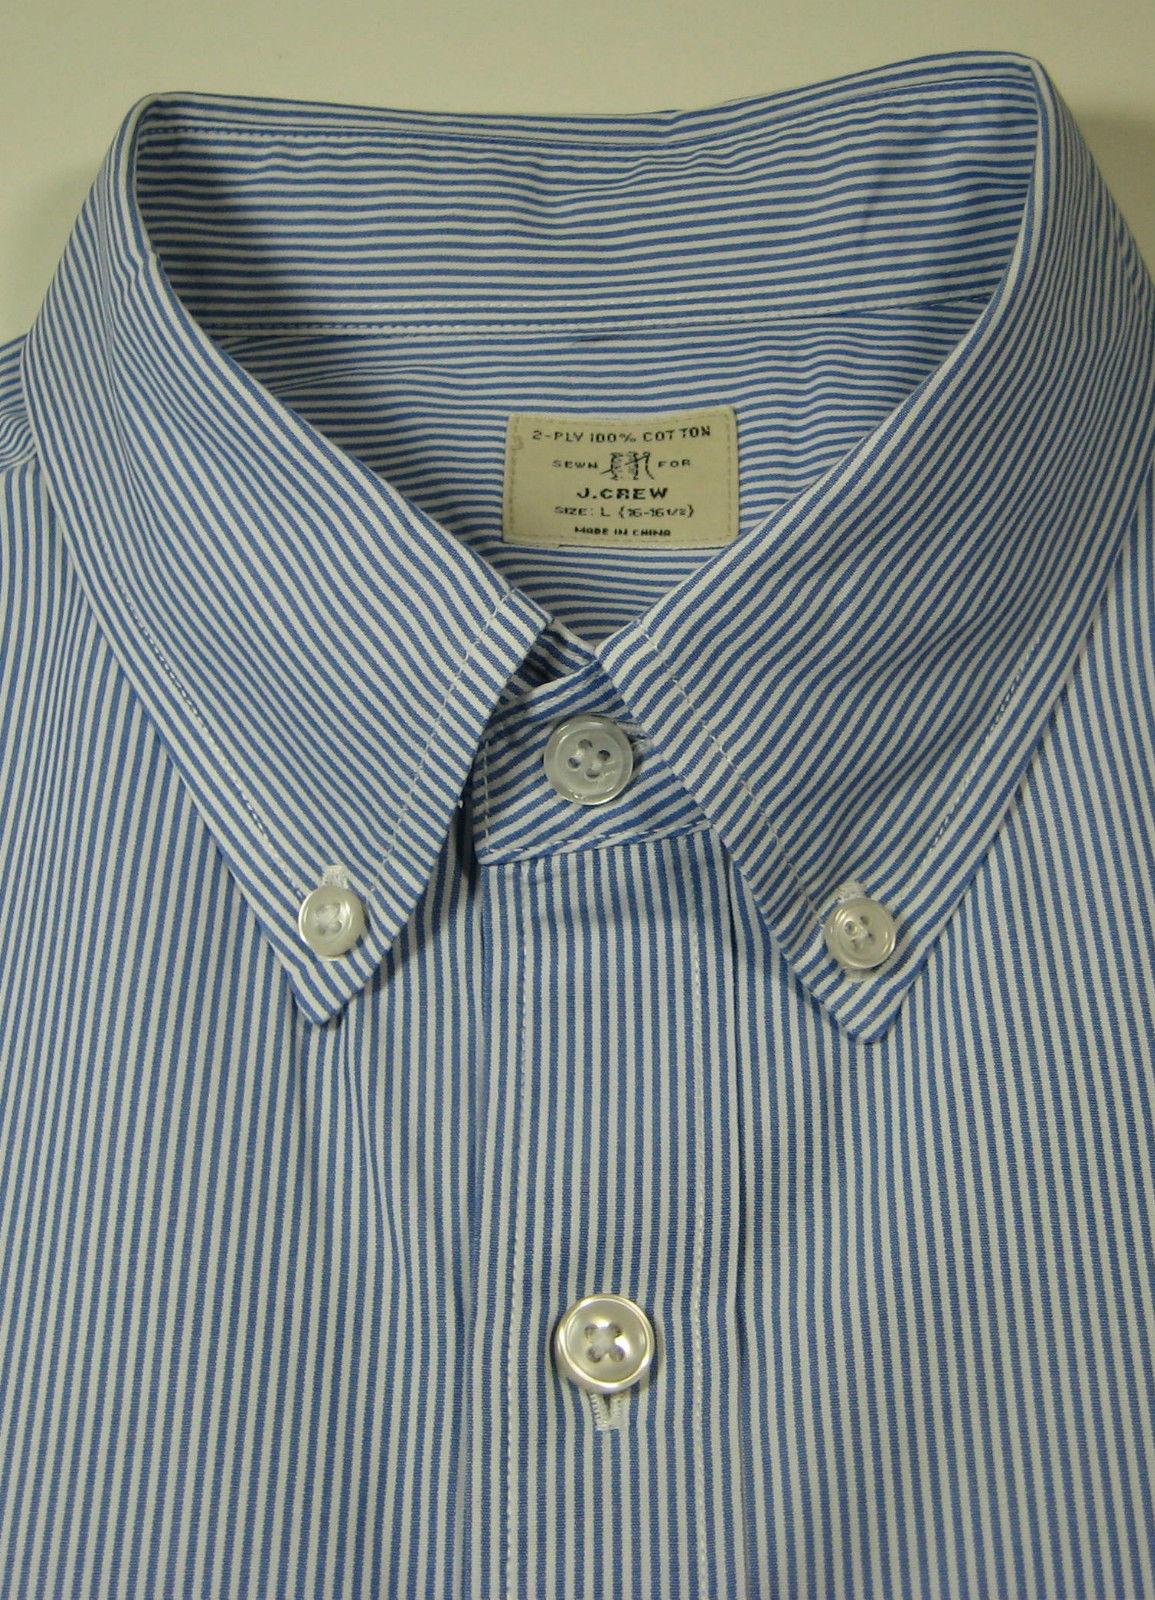 J crew lg 16 16 5 2 ply cotton blue stripe oxford dress for 2 ply cotton dress shirt